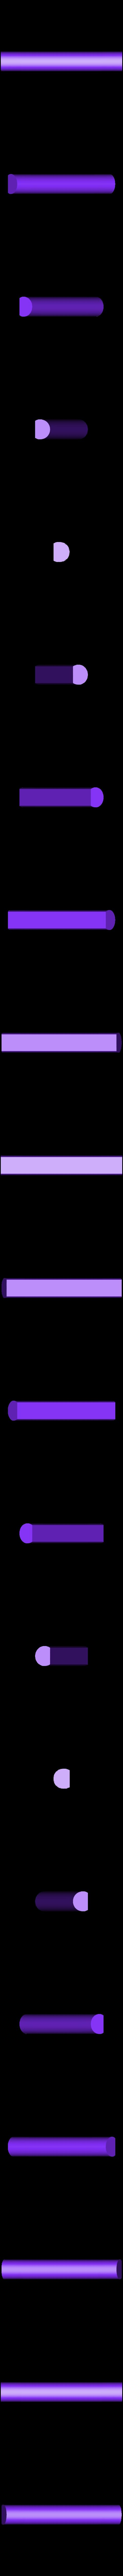 short_support1.stl Download free STL file The Crannog • 3D printable template, Earsling